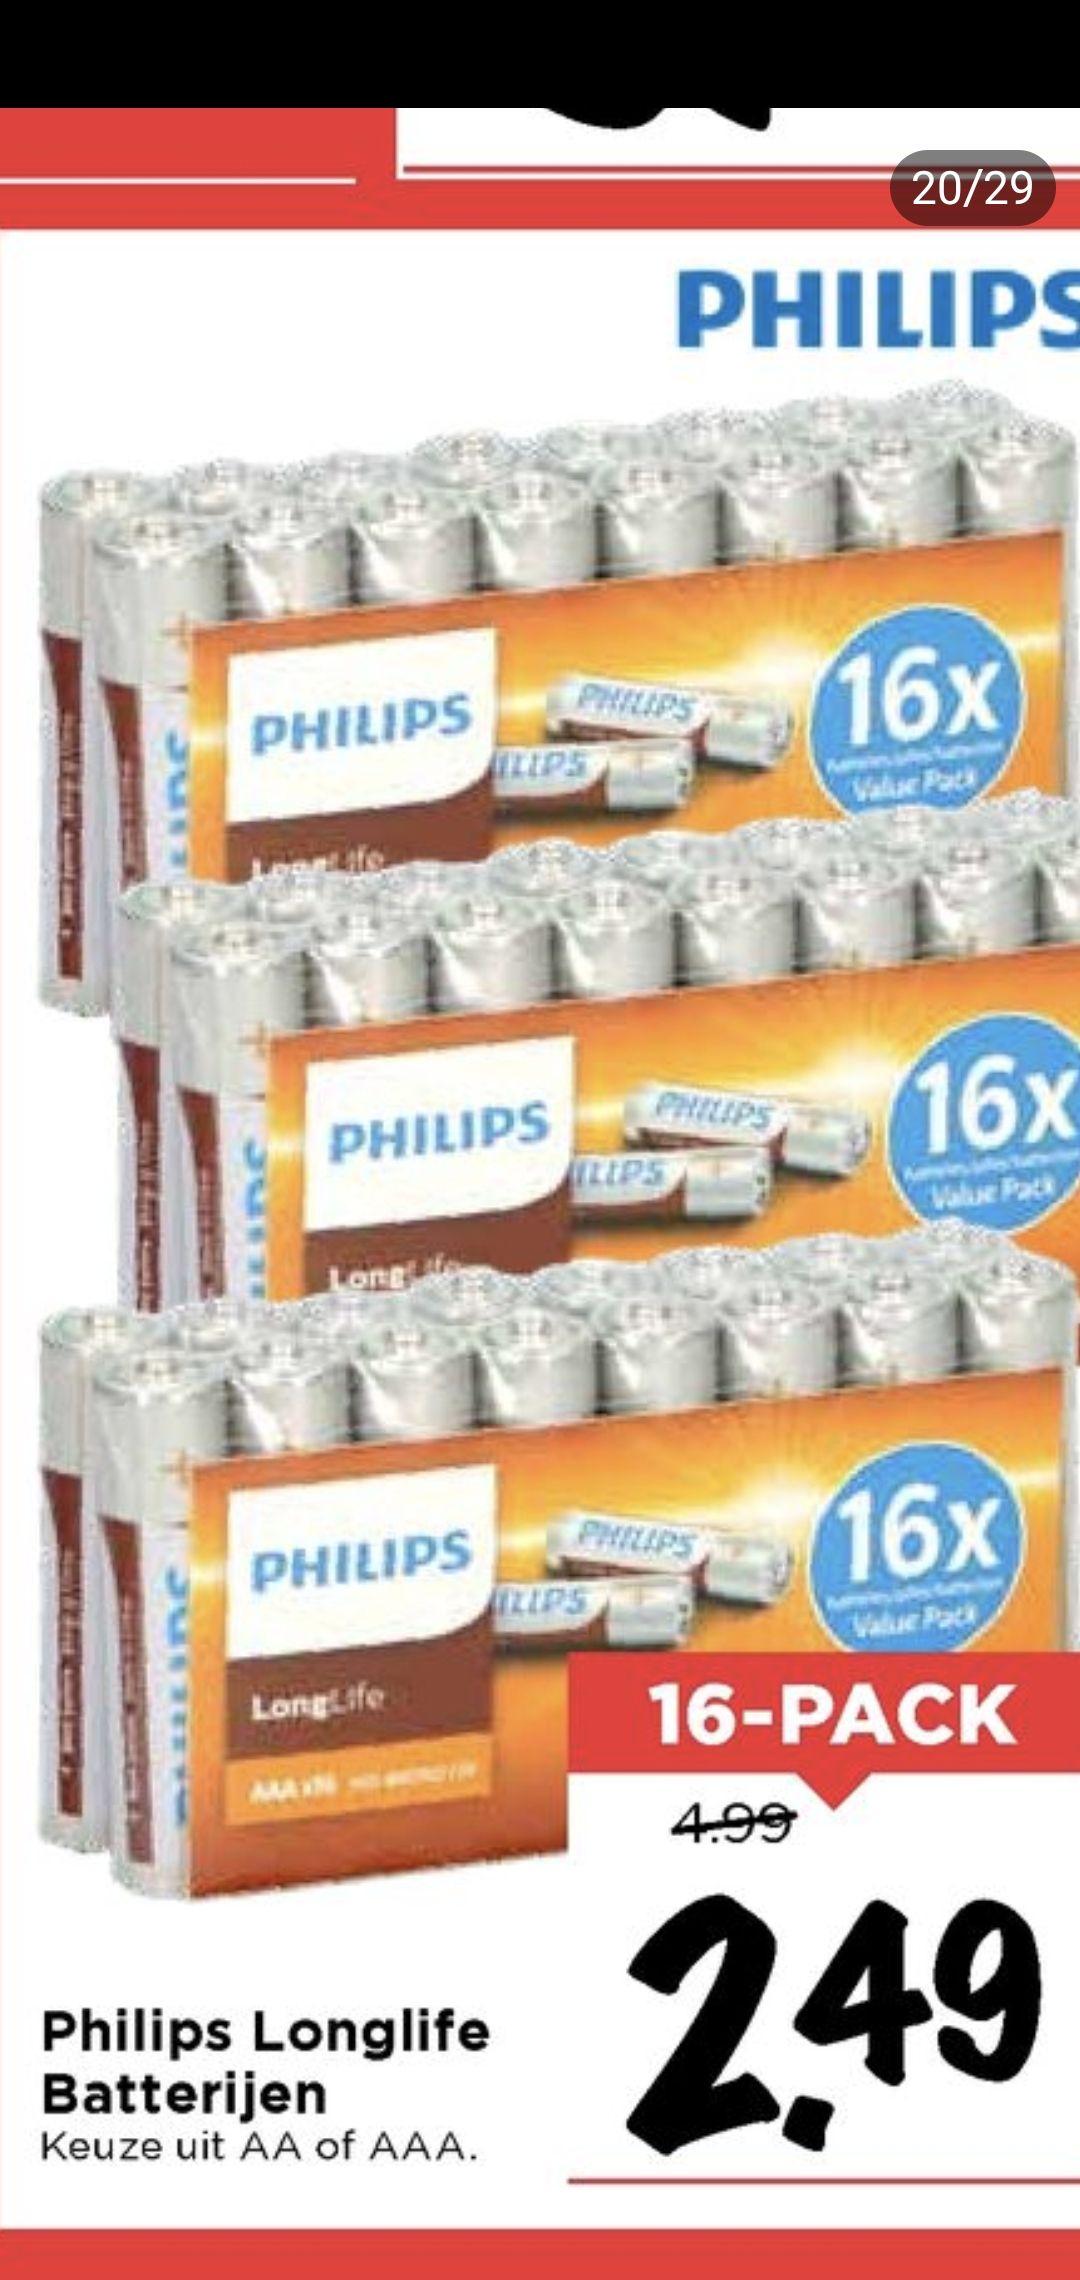 Philips Longlife (AA & AAA) batterijen @ Vomar